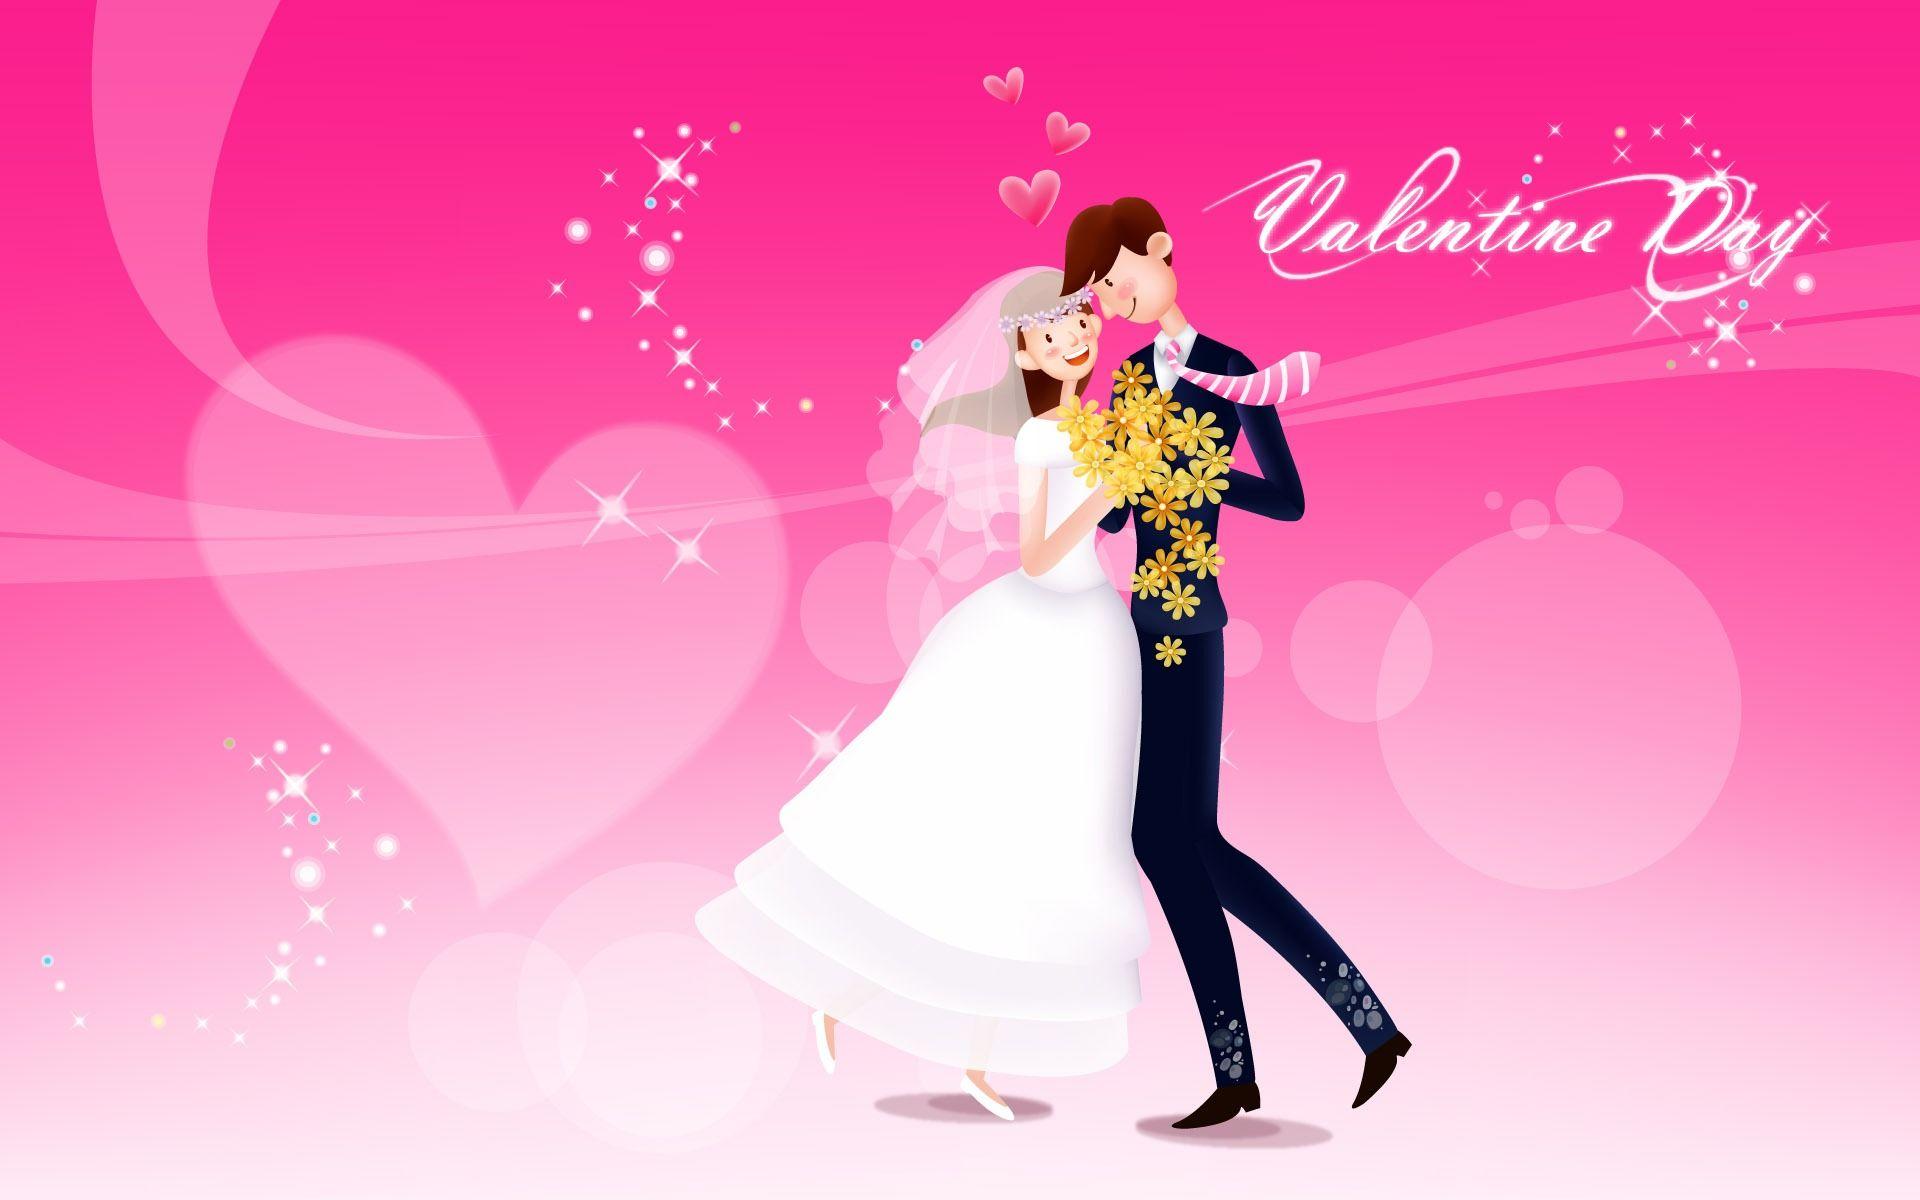 Valentine Day Love Dance WallPaper HD   Http://imashon.com/love